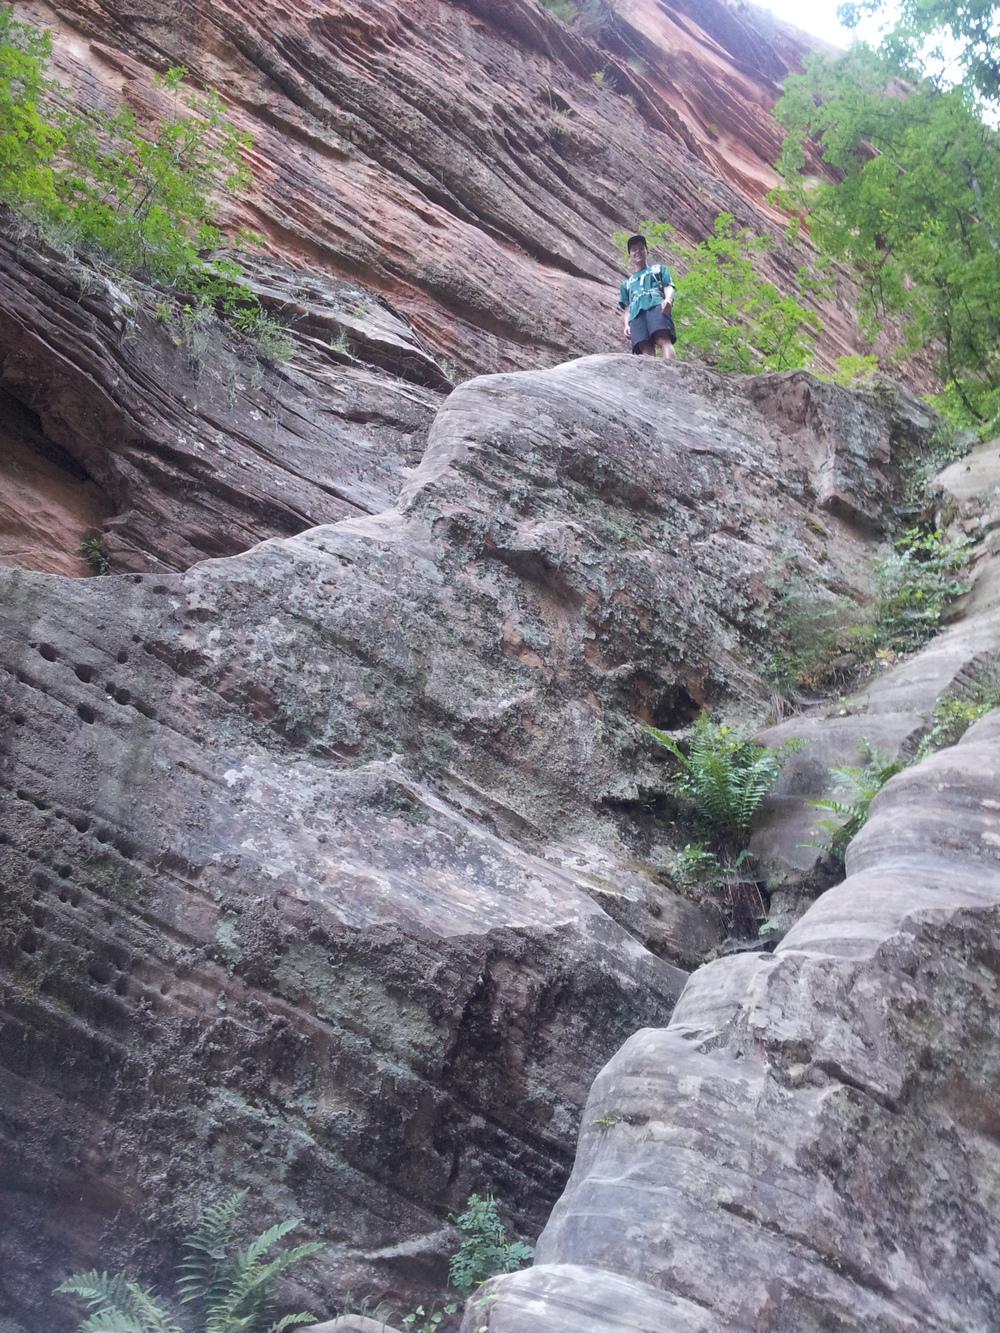 The ledge Clark climbed up onto